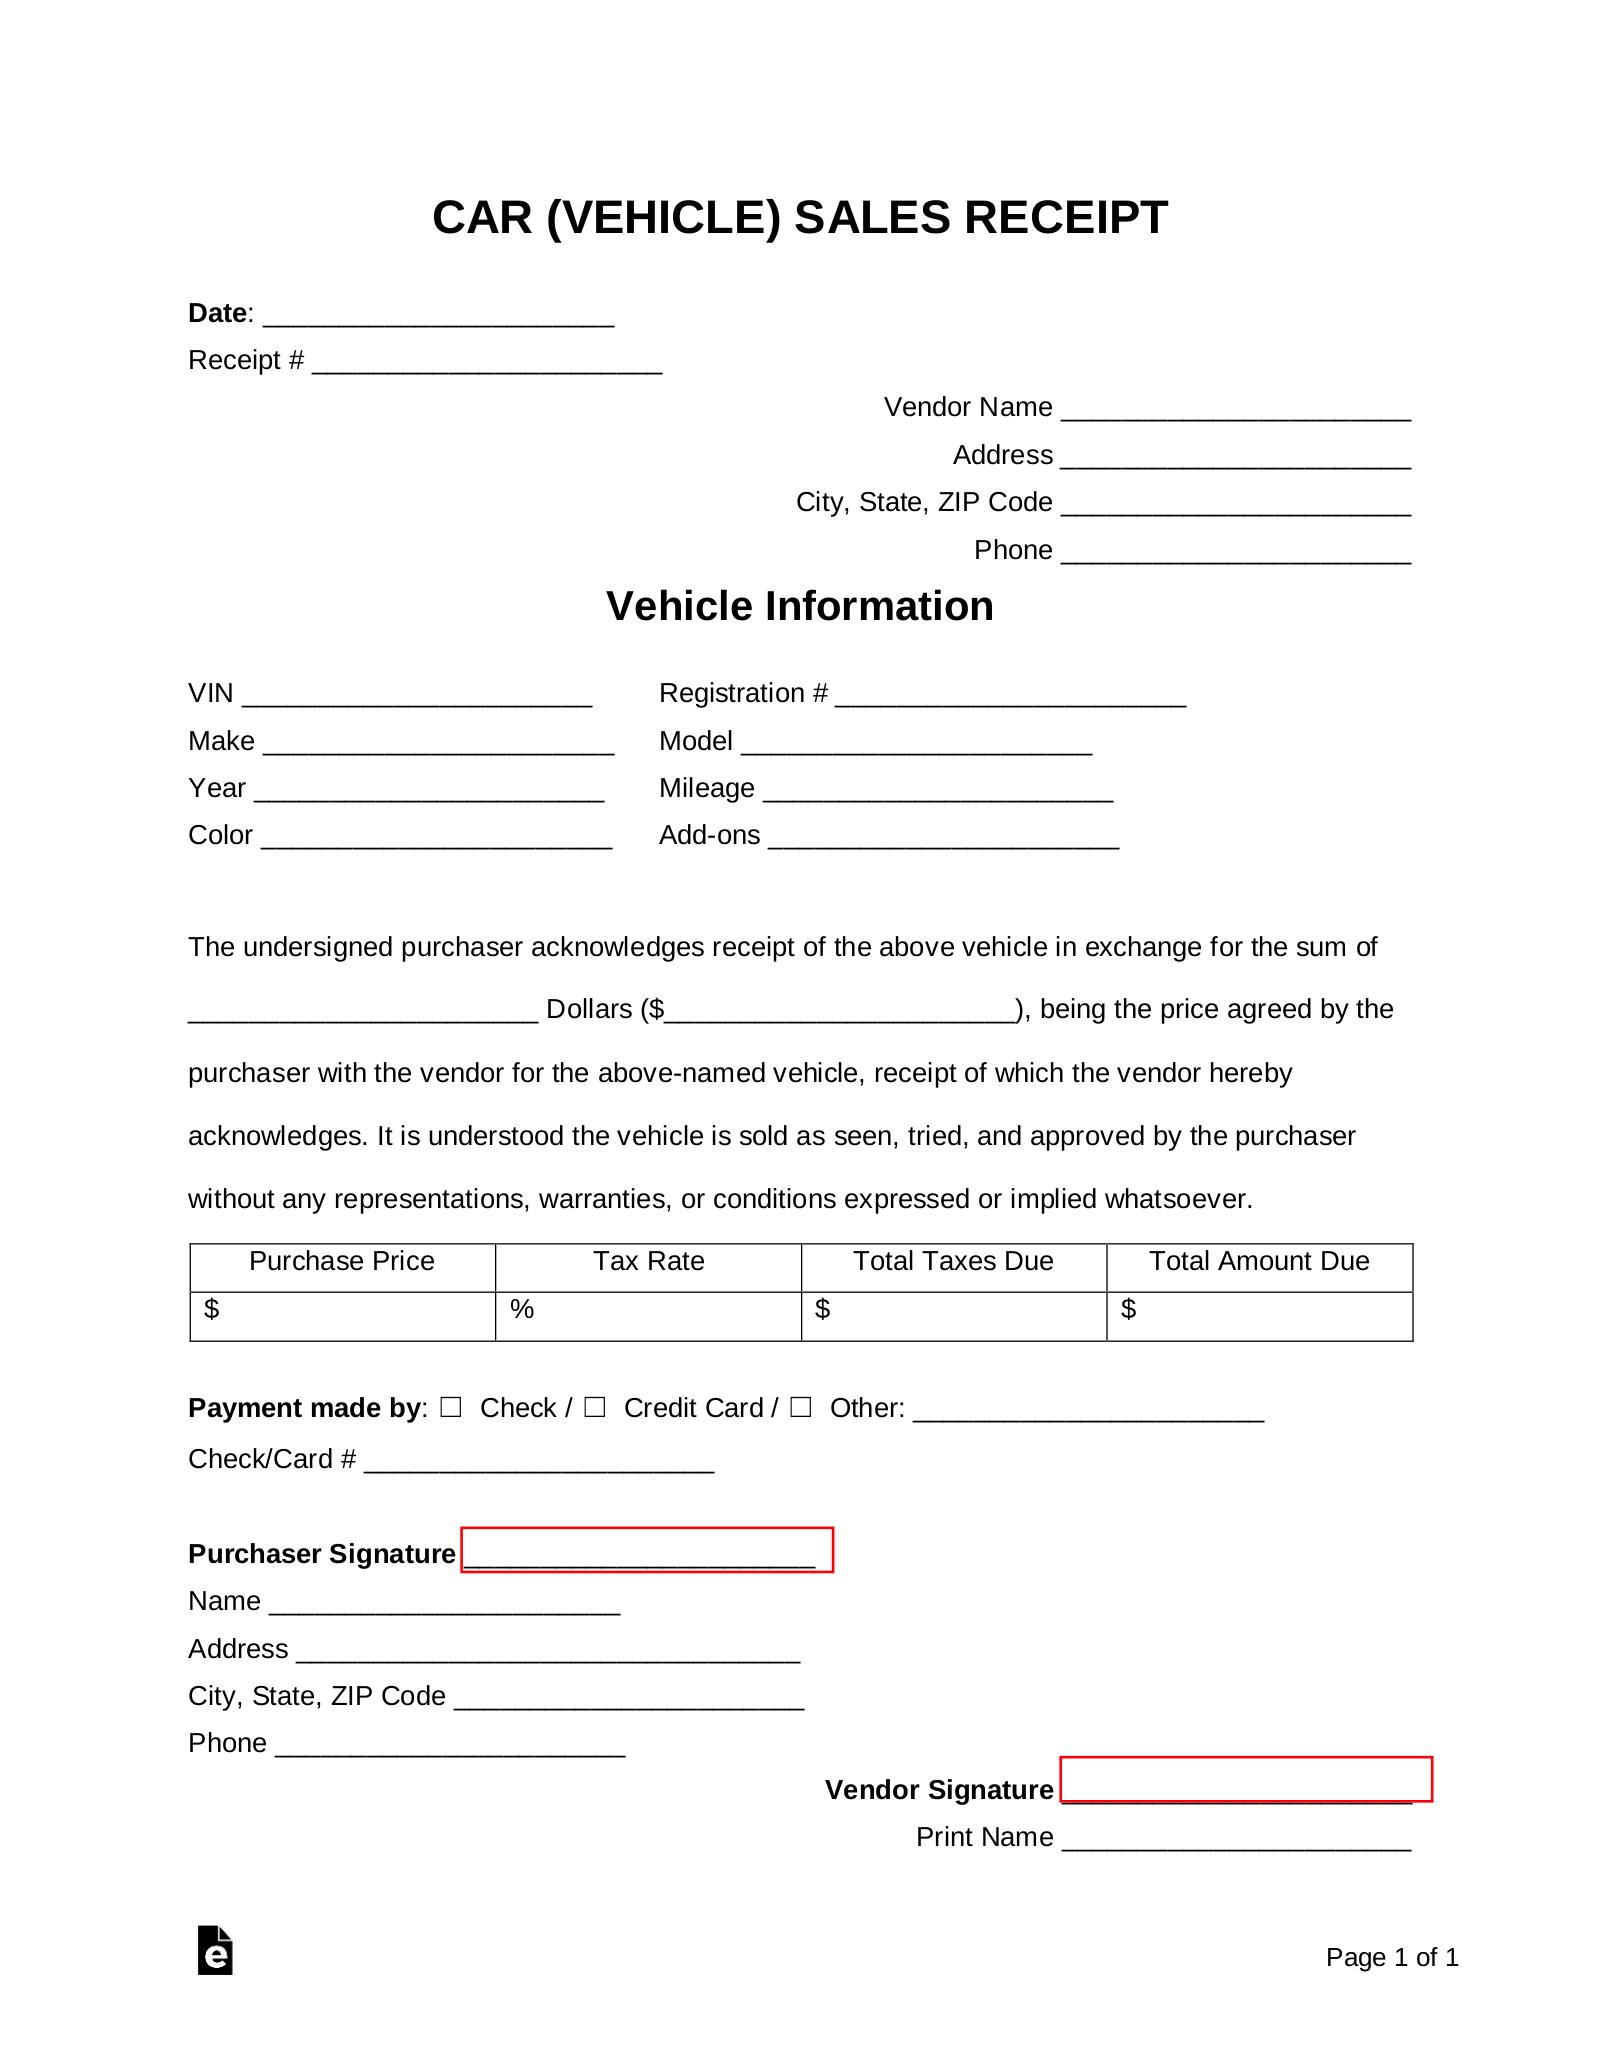 Free Car Vehicle Sales Receipt Template Pdf Word